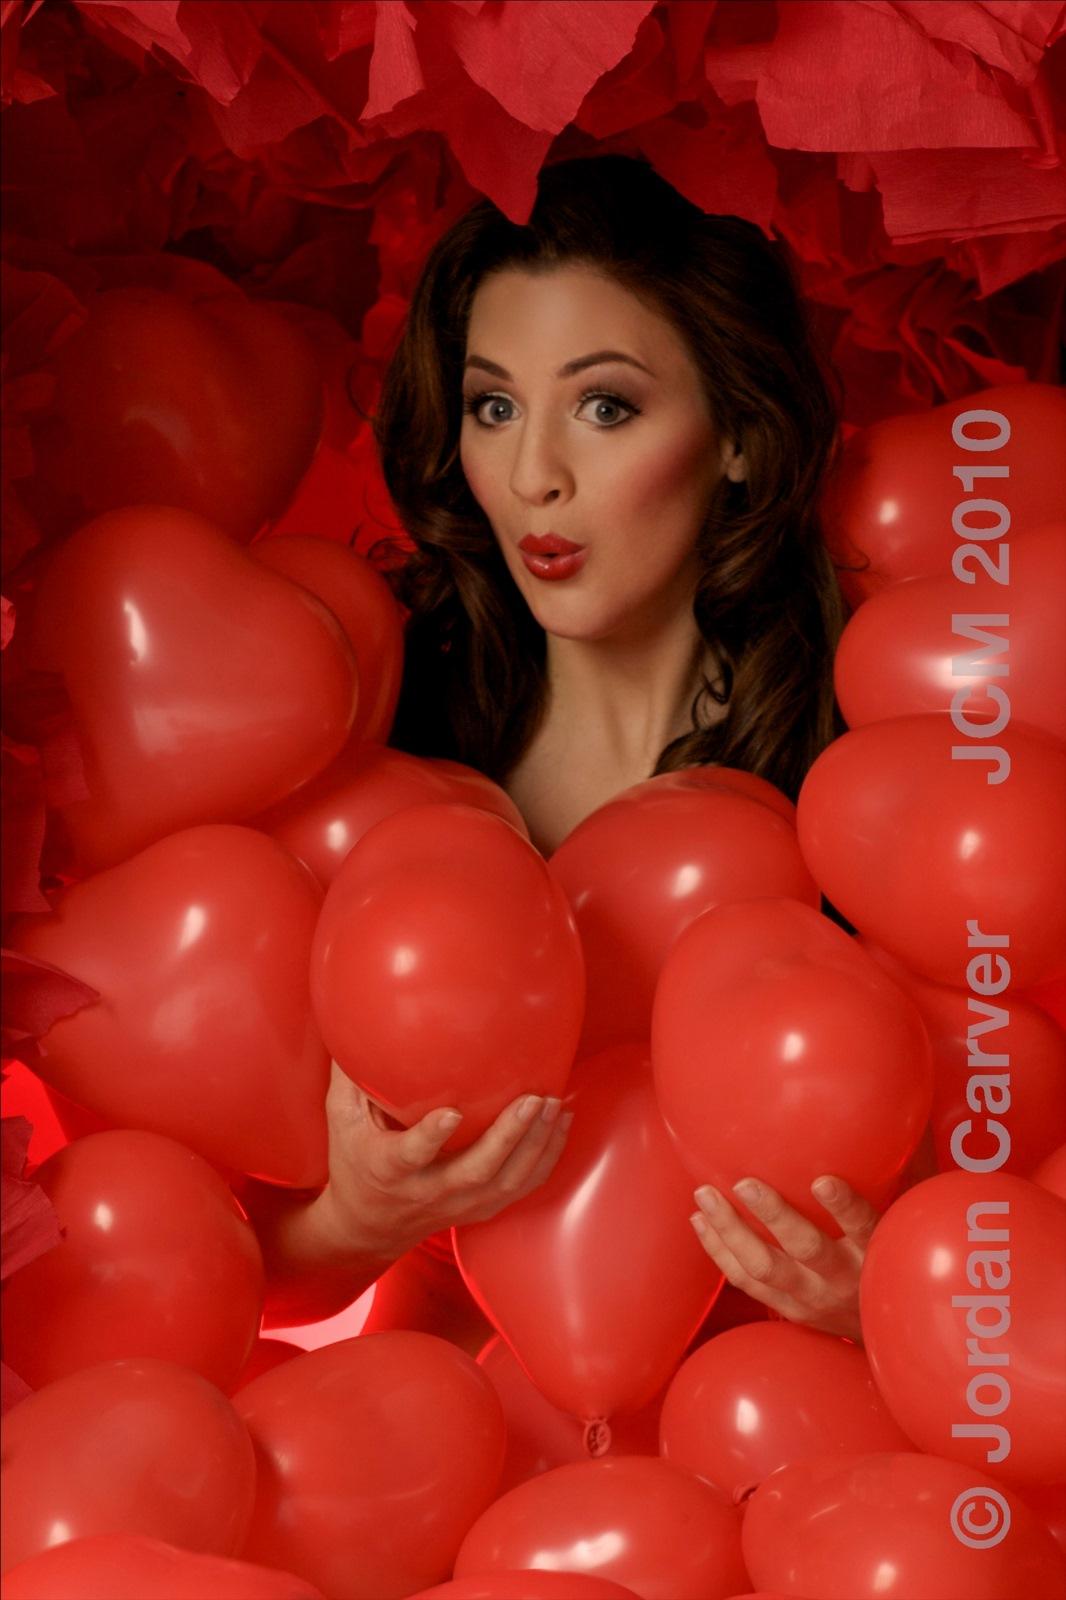 http://2.bp.blogspot.com/-pOs61Las8DQ/TenRhOhNlII/AAAAAAAAAmQ/IqU5Ujt4YhA/s1600/Jordan_Carver_Photo_Valentine+%252810%2529.jpg